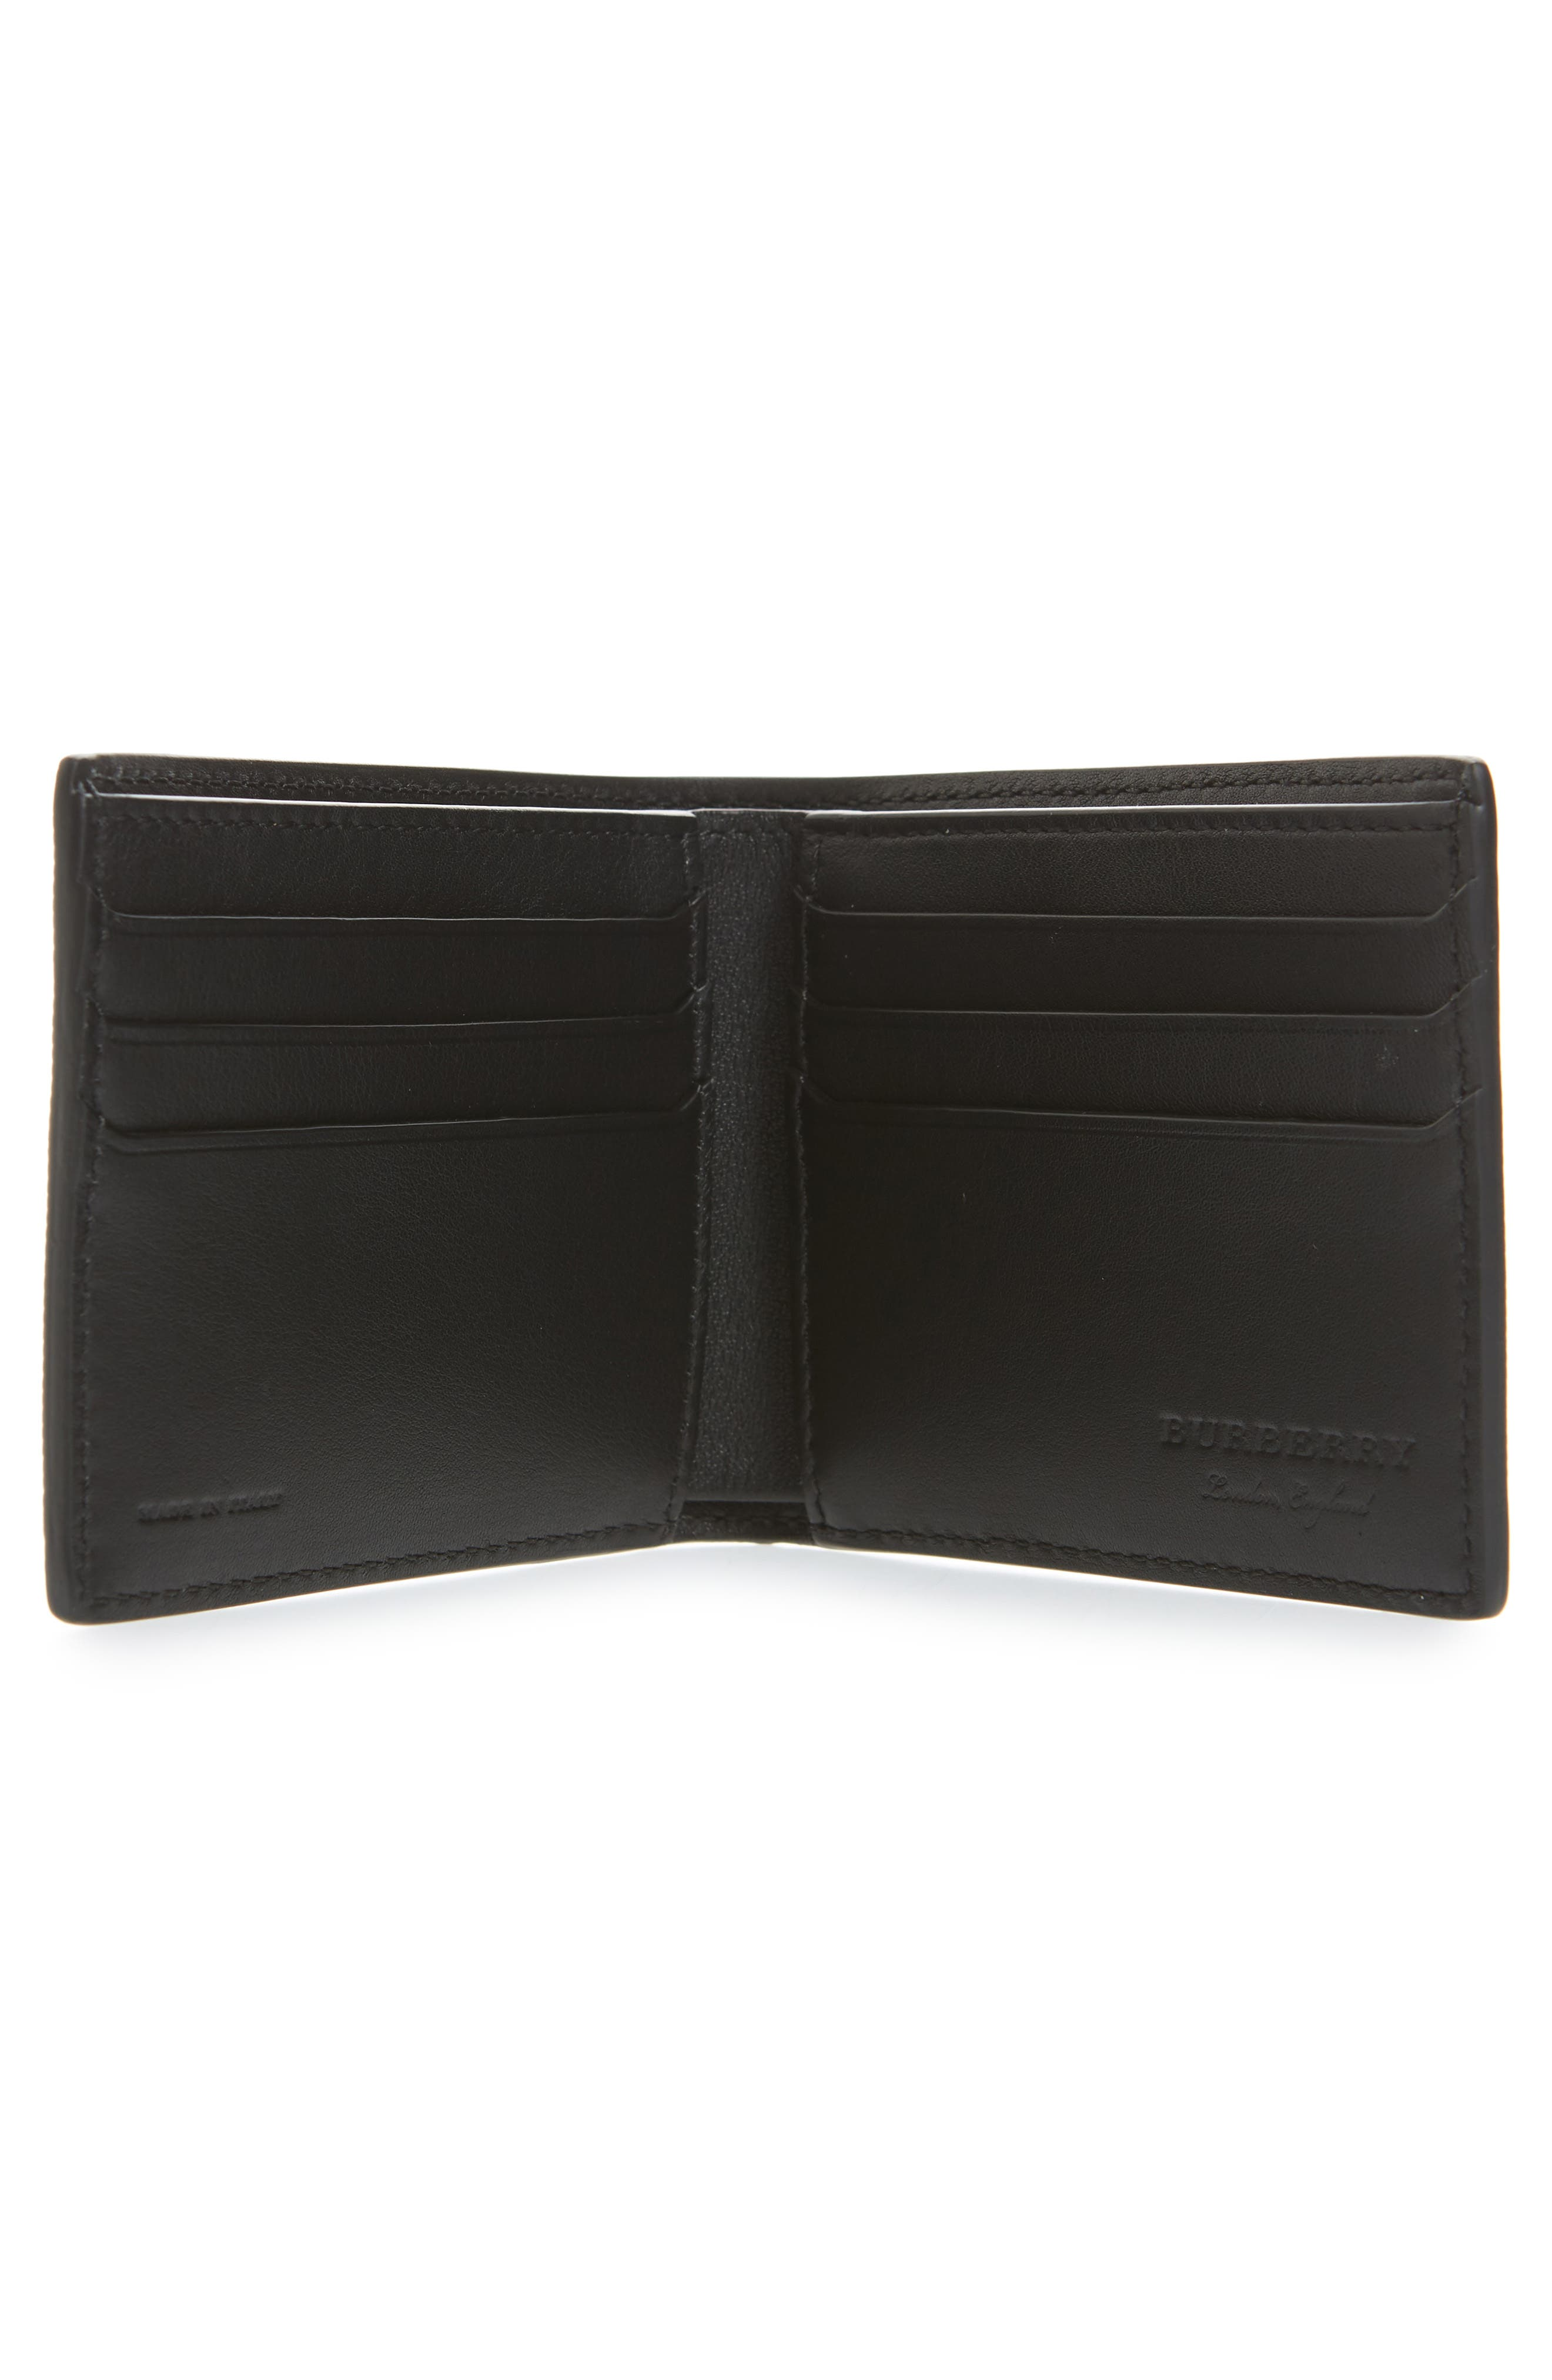 Trench Splash Leather Wallet,                             Alternate thumbnail 3, color,                             Black/ Splash